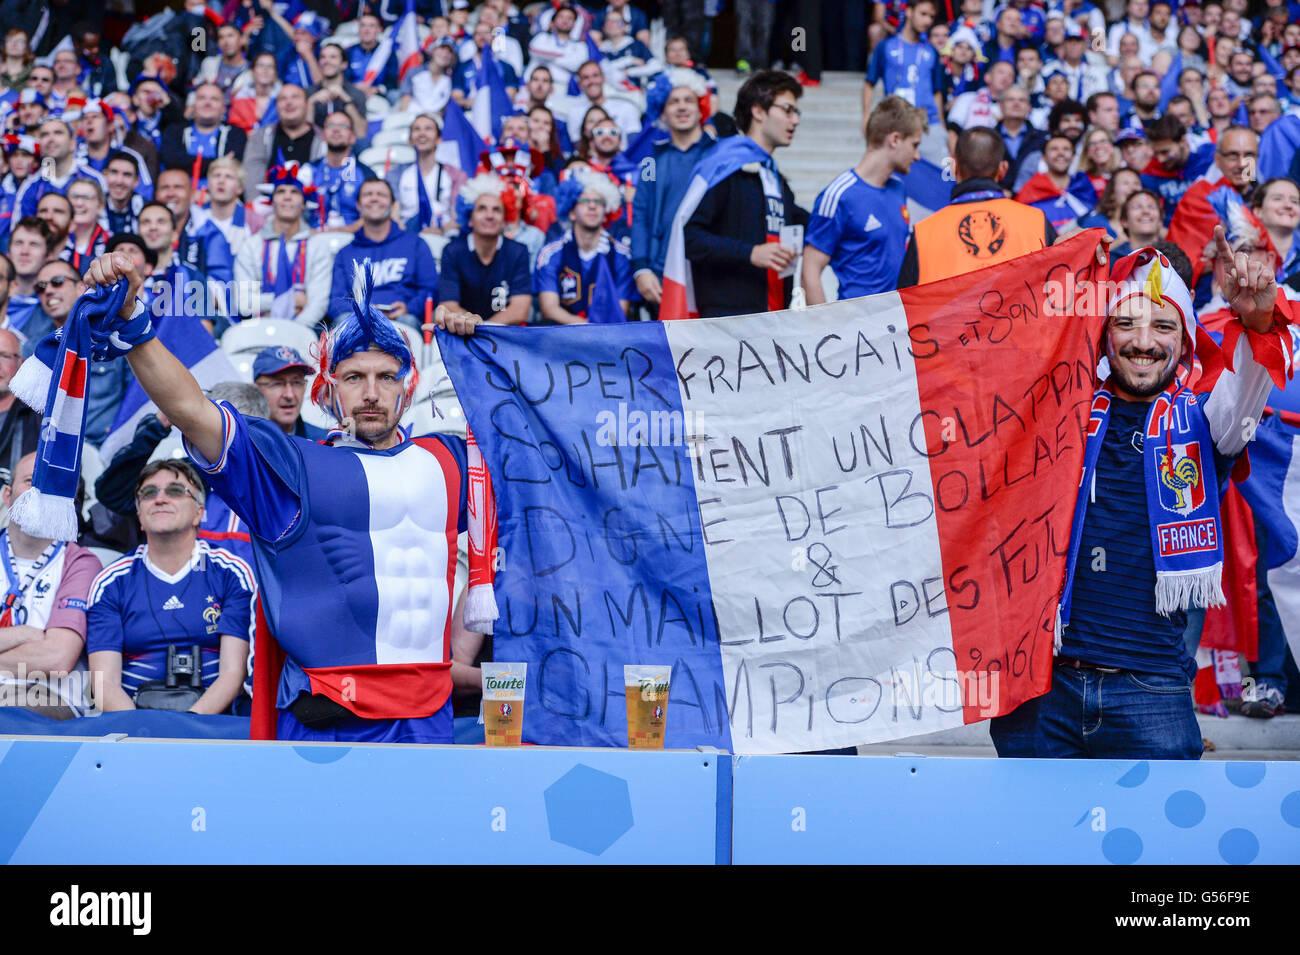 supporters france june 19 2016 football uefa euro france stock photo royalty free. Black Bedroom Furniture Sets. Home Design Ideas